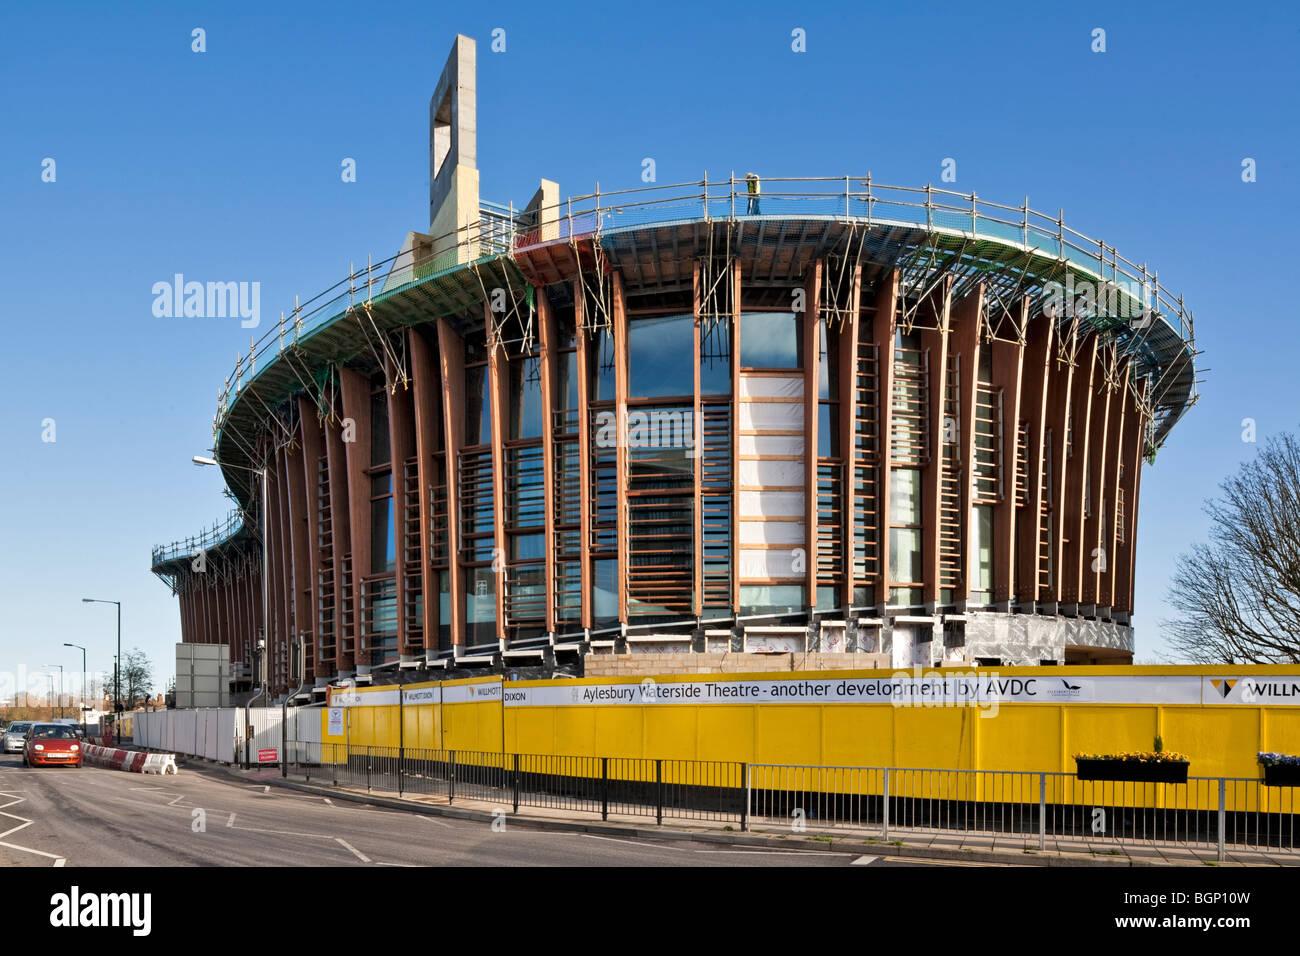 Waterside Theatre site in Aylesbury, Buckinghamshire - Stock Image